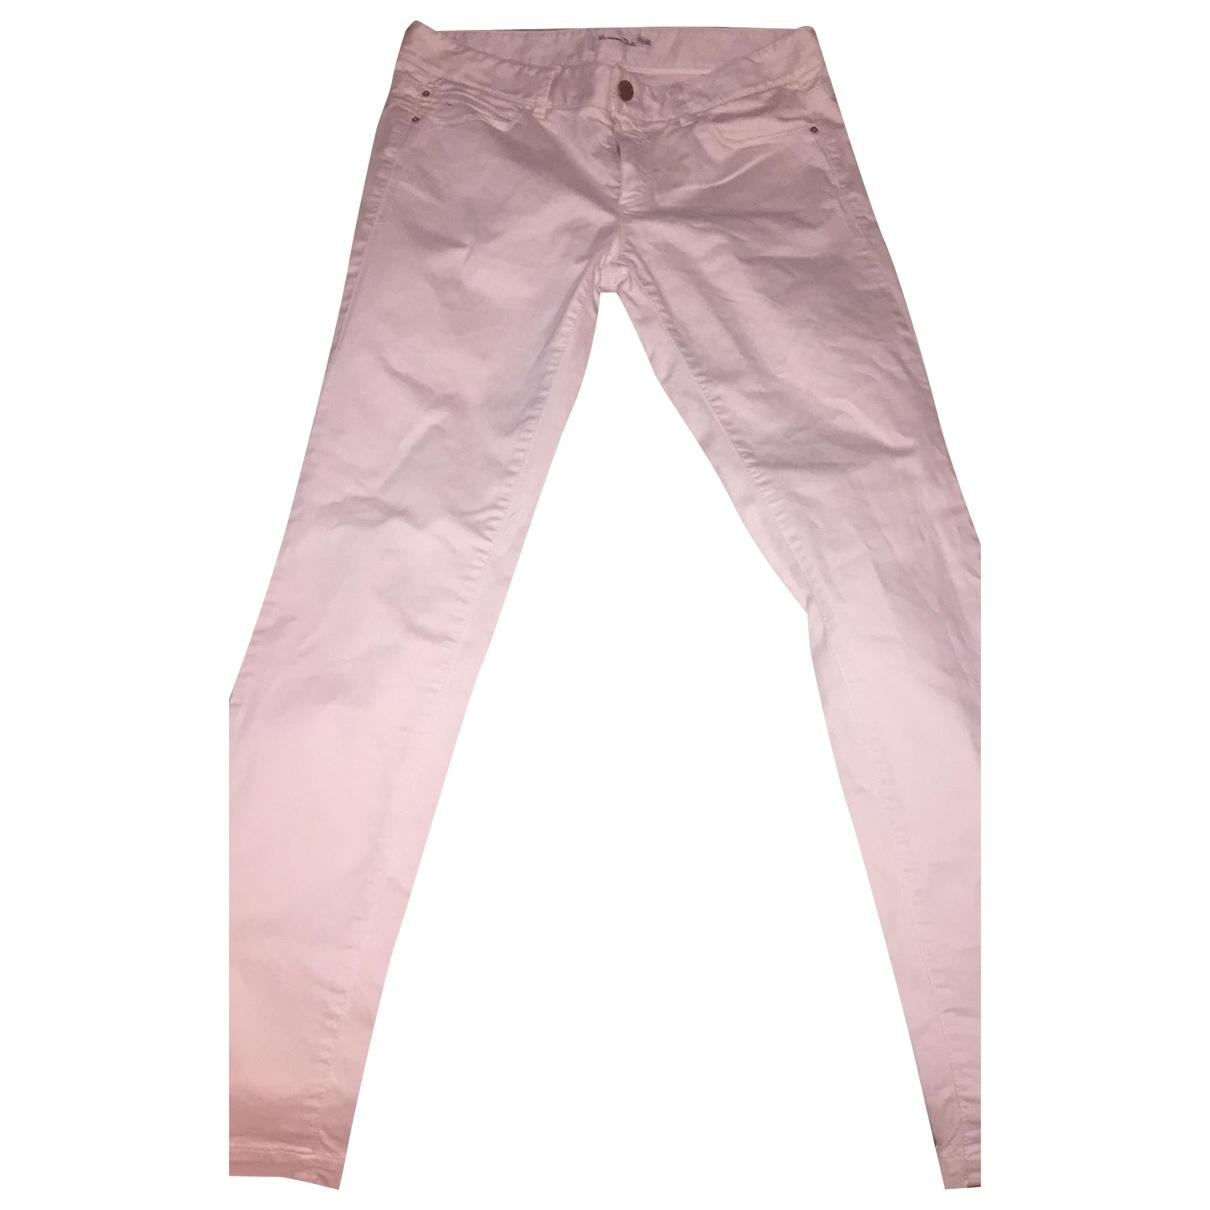 Massimo Dutti - Pantalon   pour femme en coton - blanc